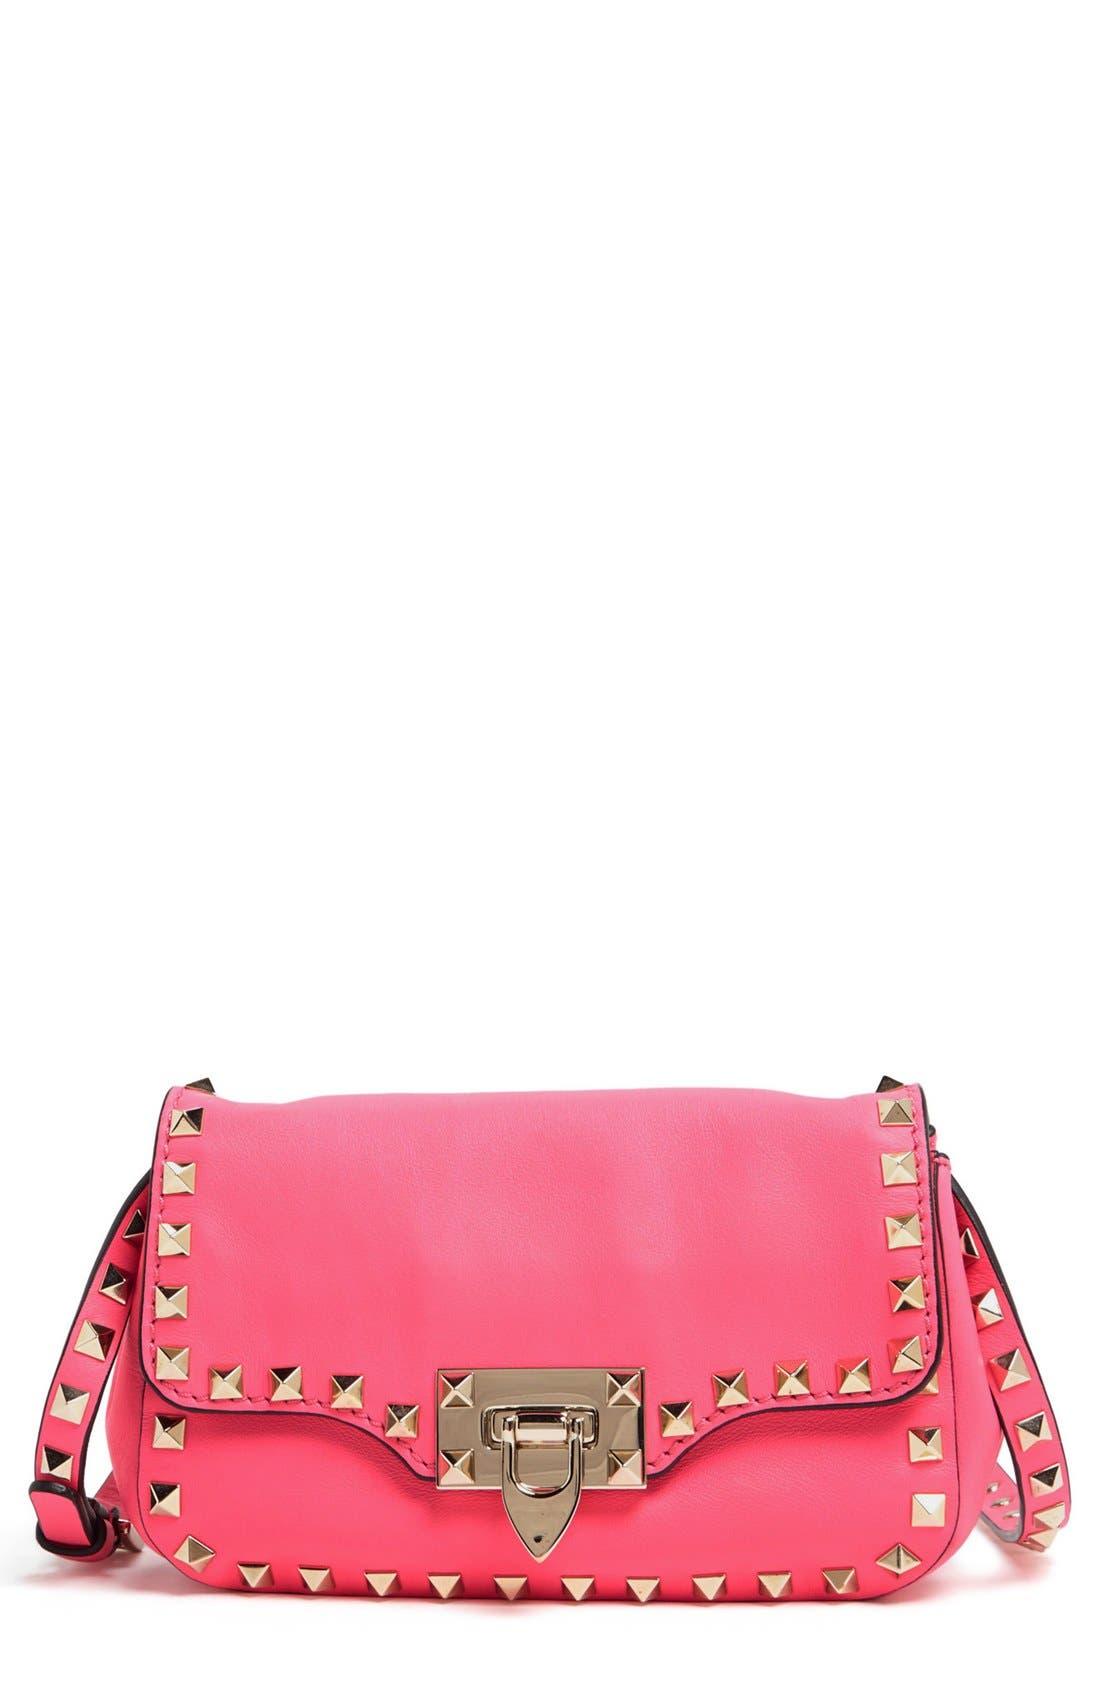 Alternate Image 1 Selected - Valentino 'Small Rockstud' Flap Bag